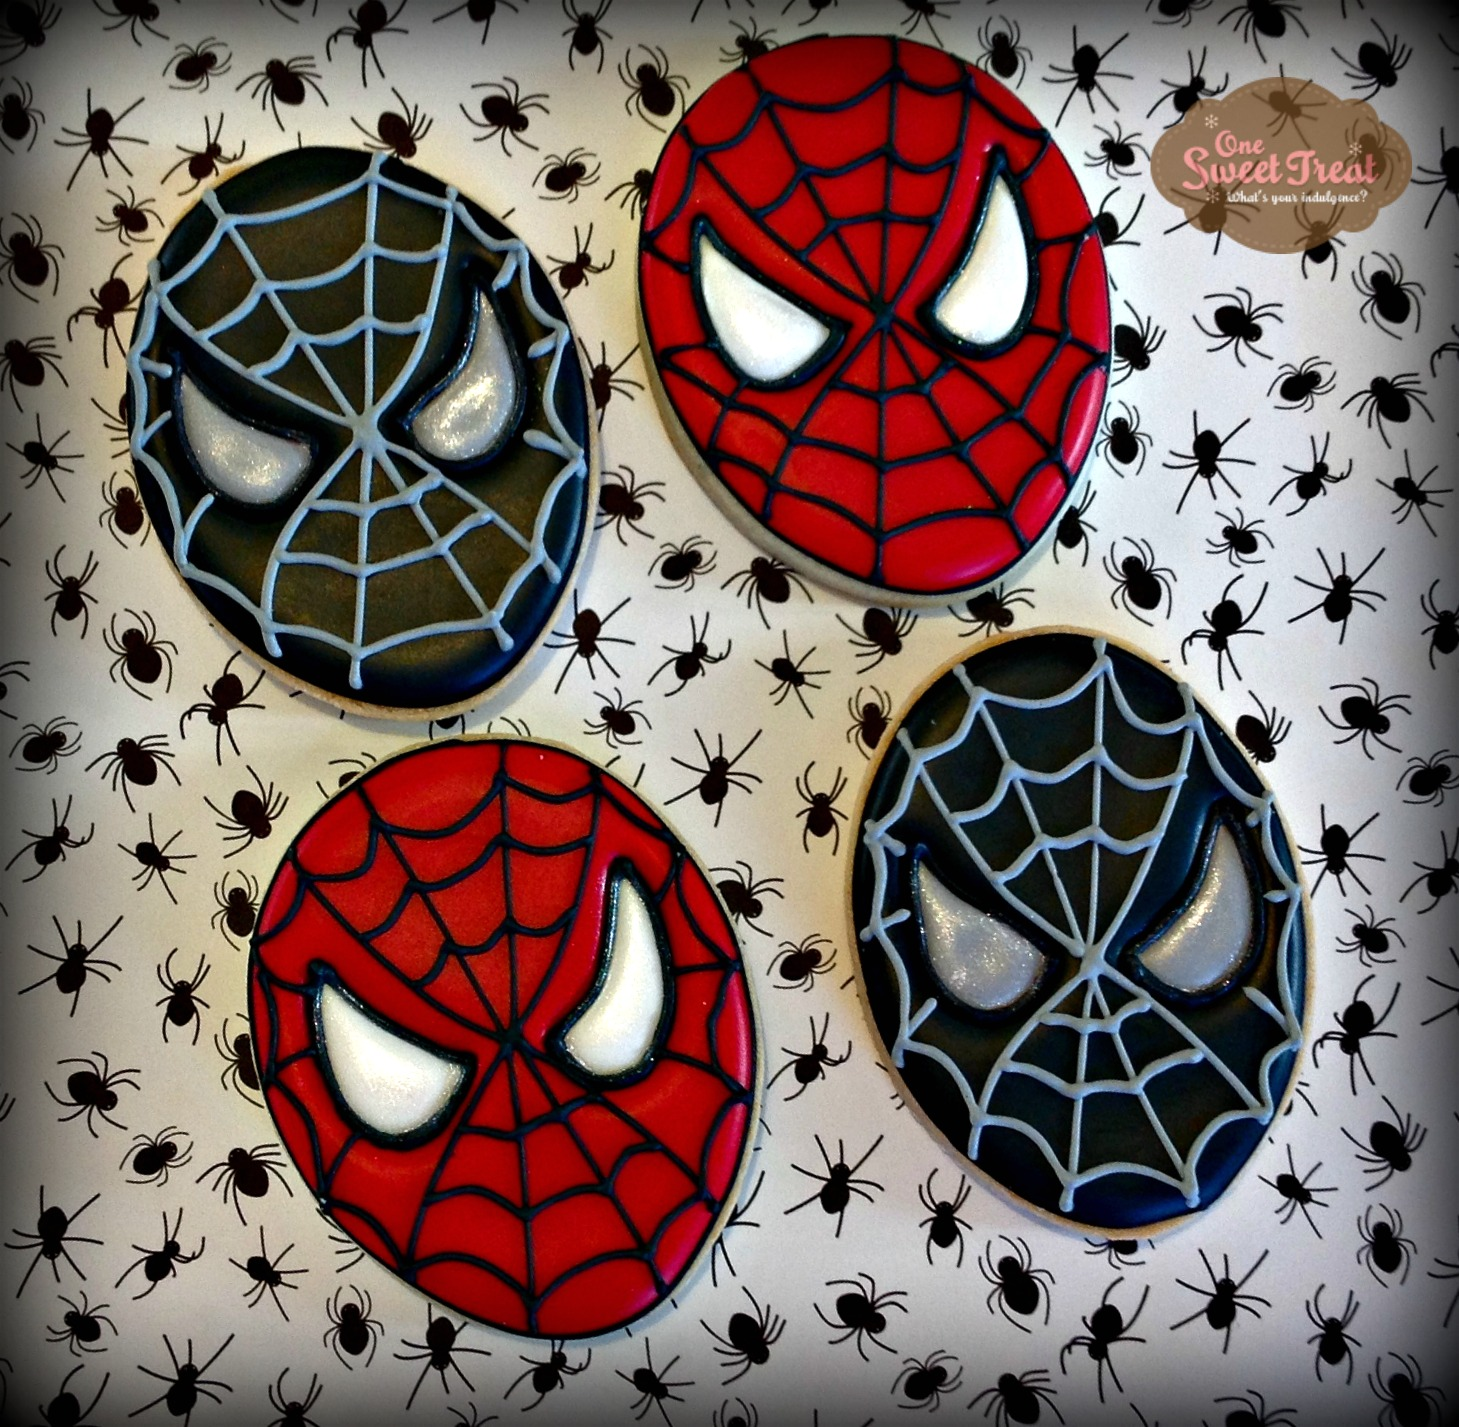 b-w-spiderman-img_5374